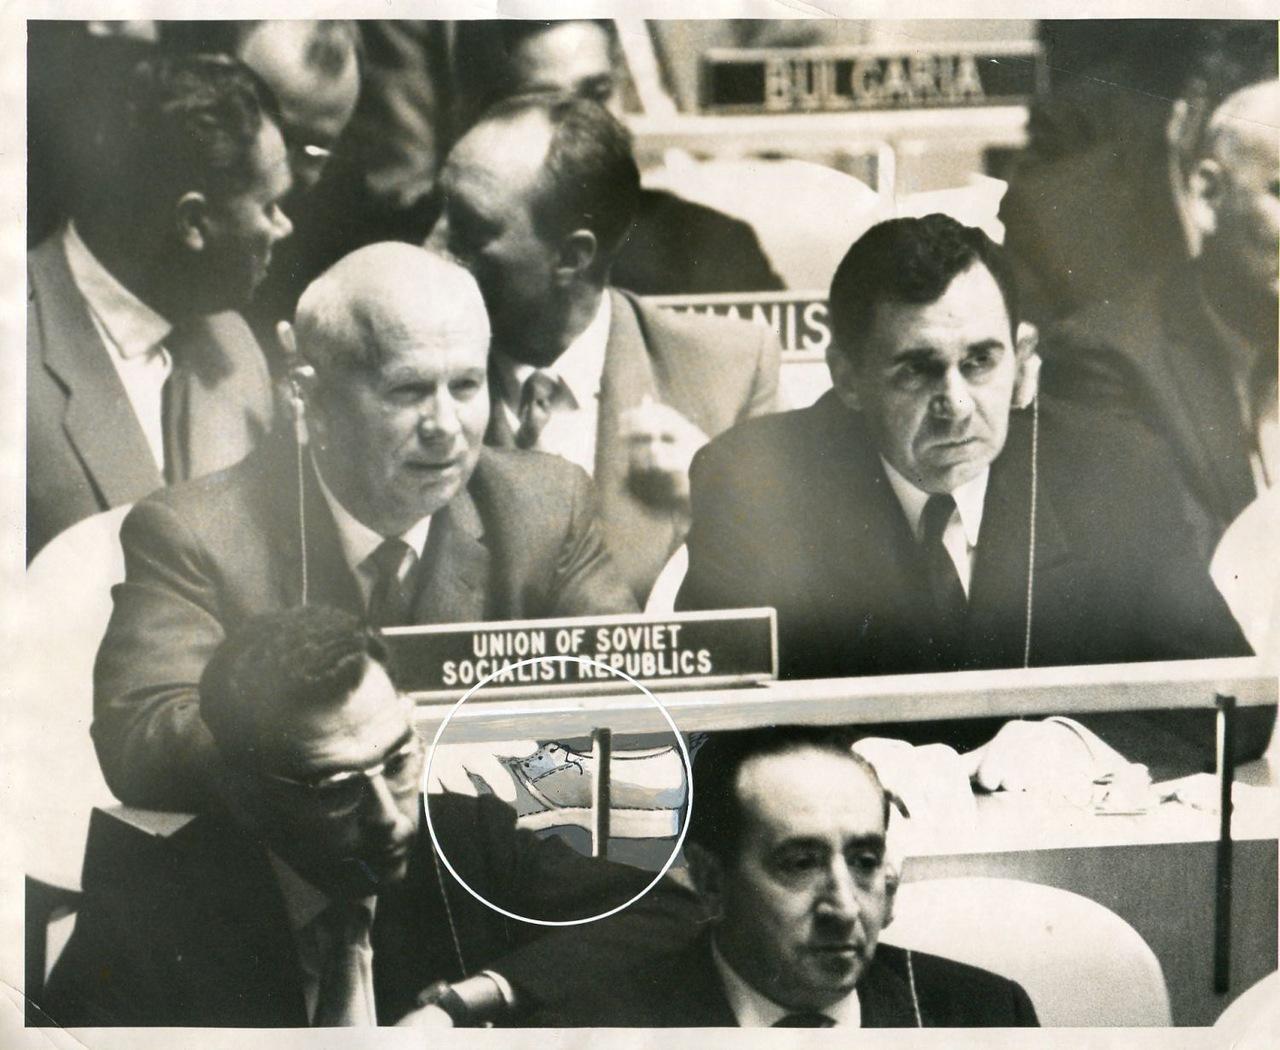 Н. С. Хрущёв в ООН. Башмак пока спрятан